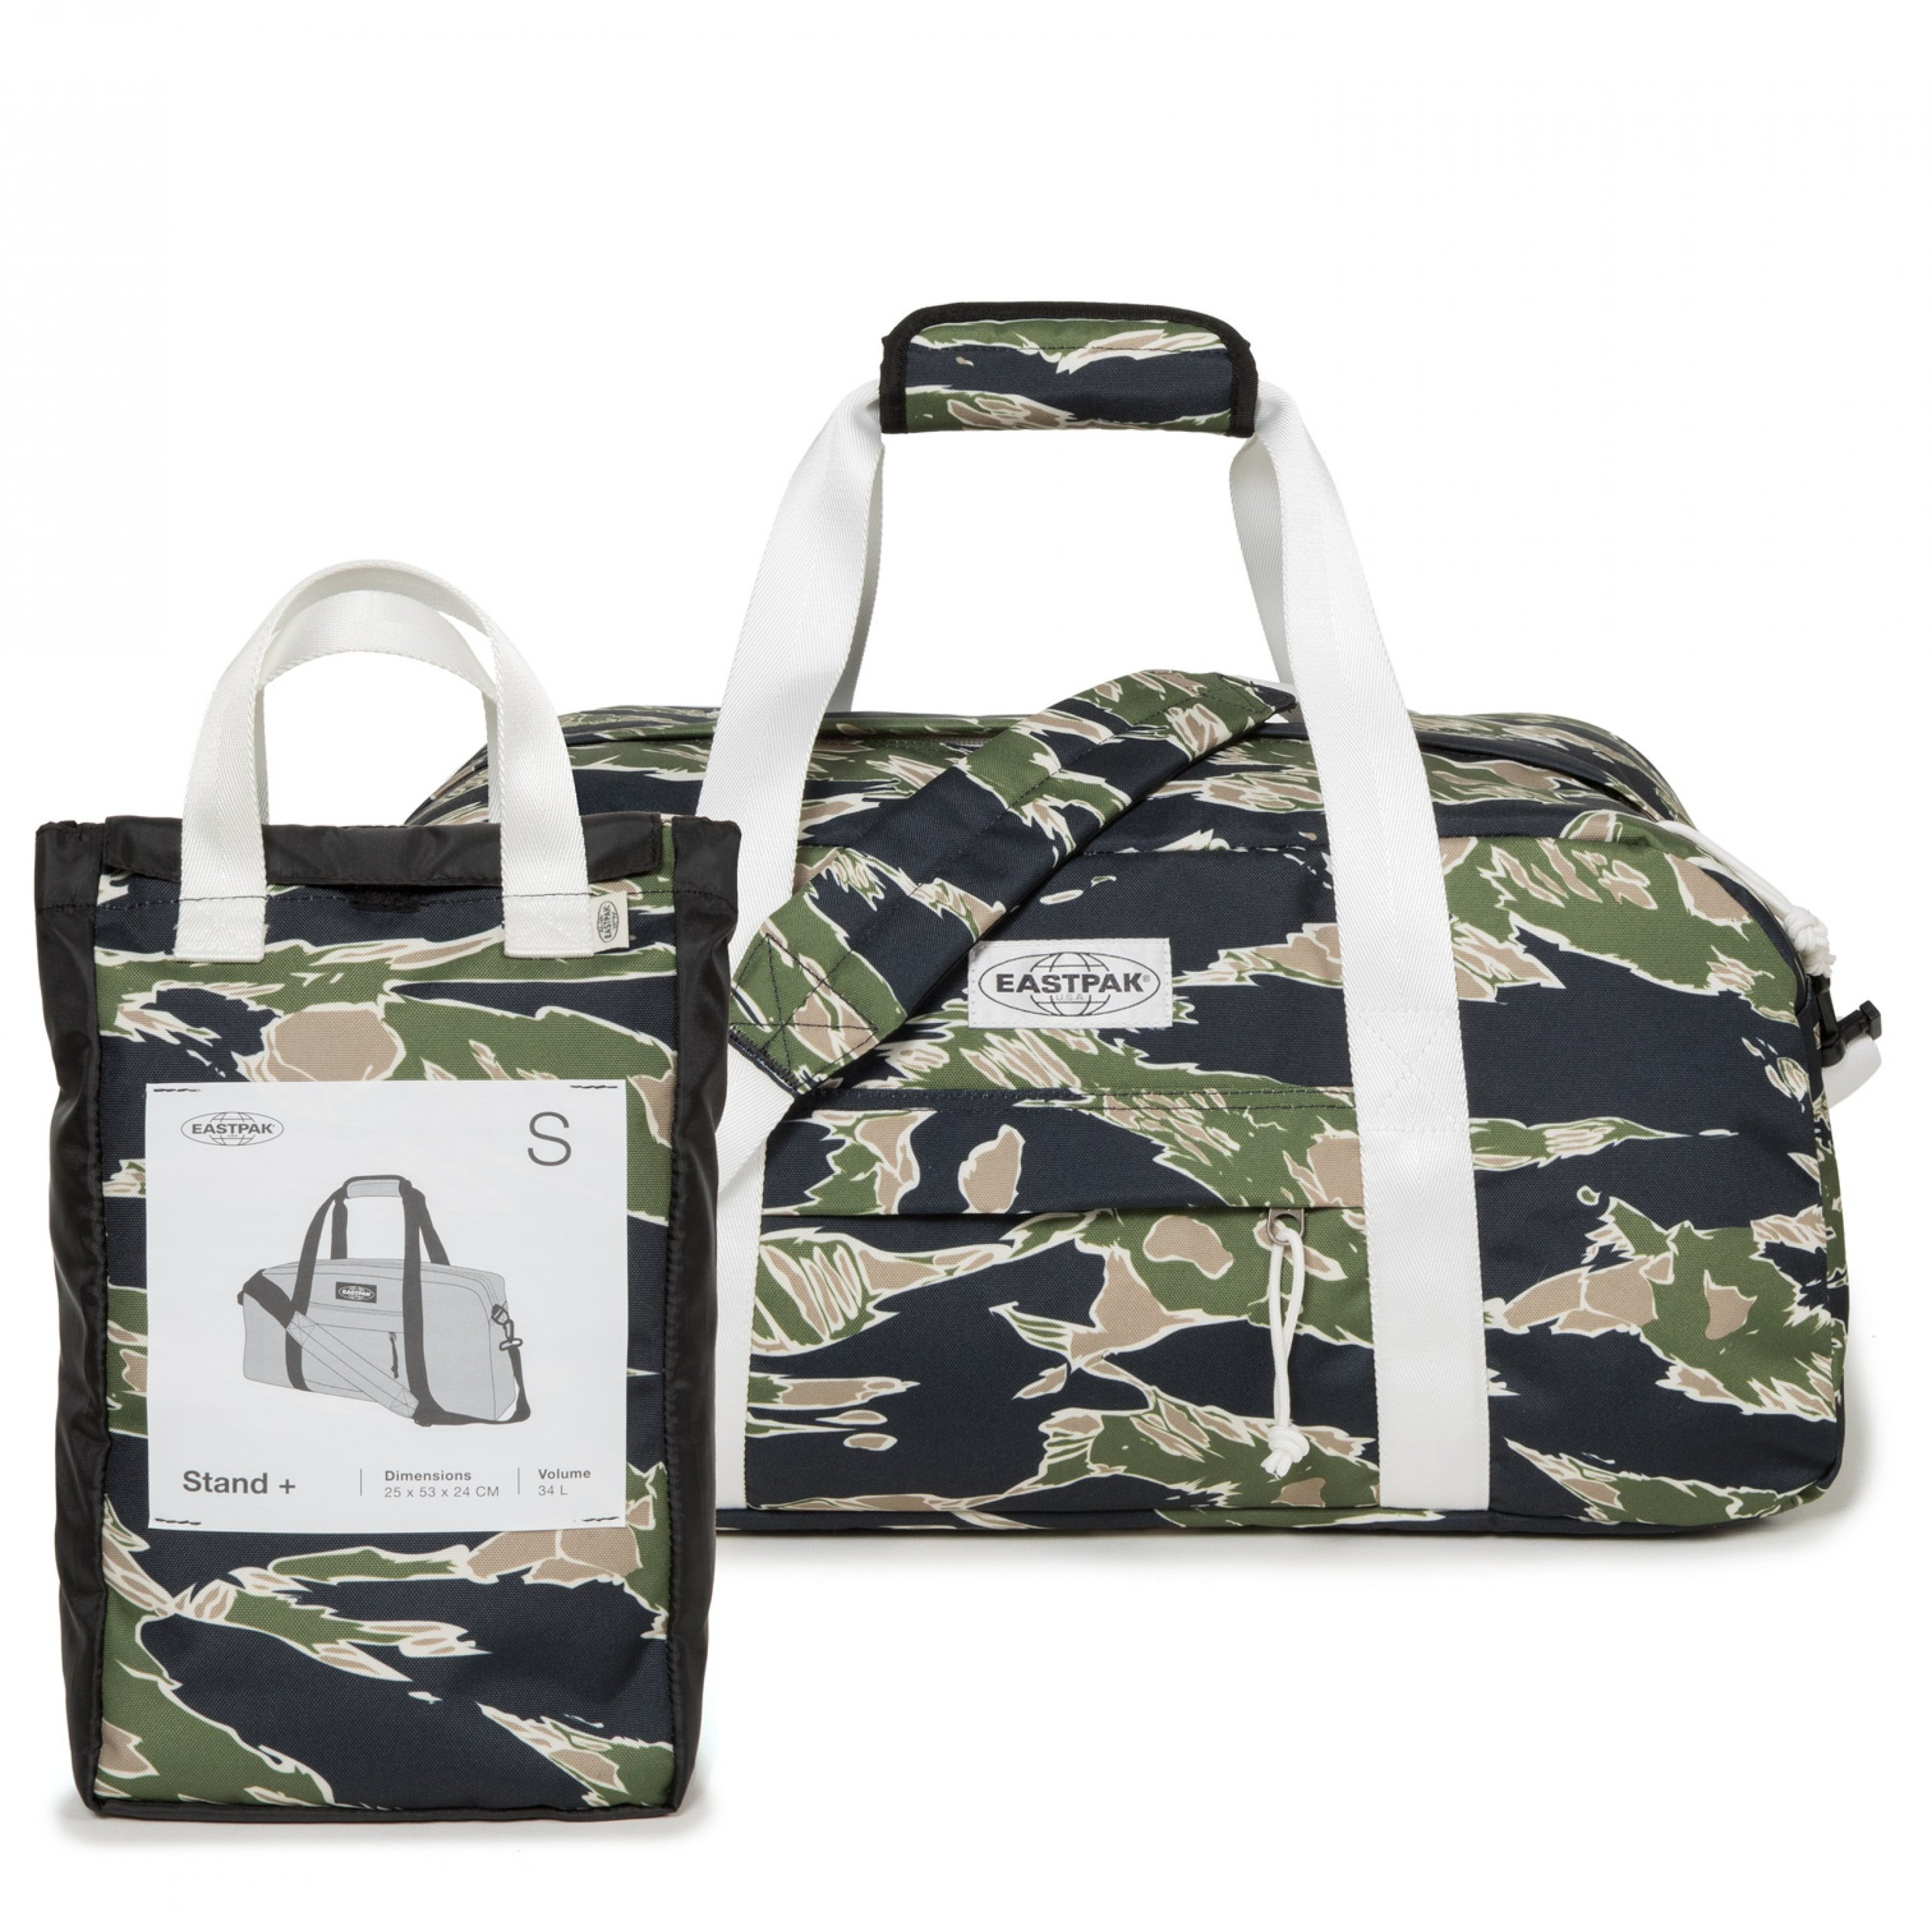 Eastpak Packable duffle Camo'ed Forest_£60.00.jpeg